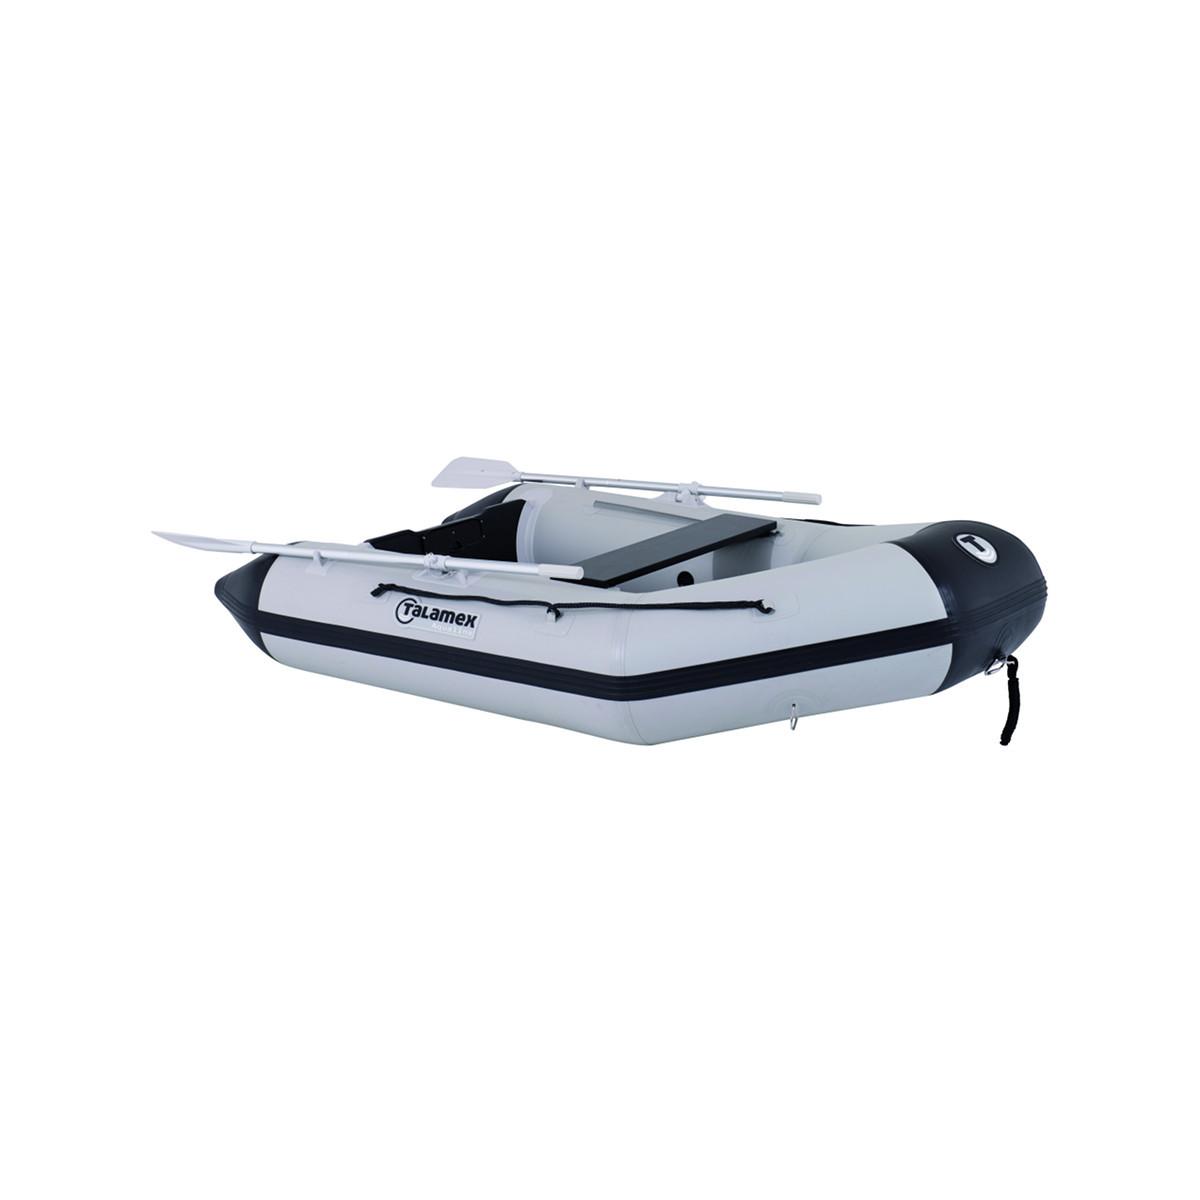 Talamex Aqualine QLA270 opblaasbare rubberboot met opblaasbare bodem, lengte 2,70m, lengte 2,70m, grijs